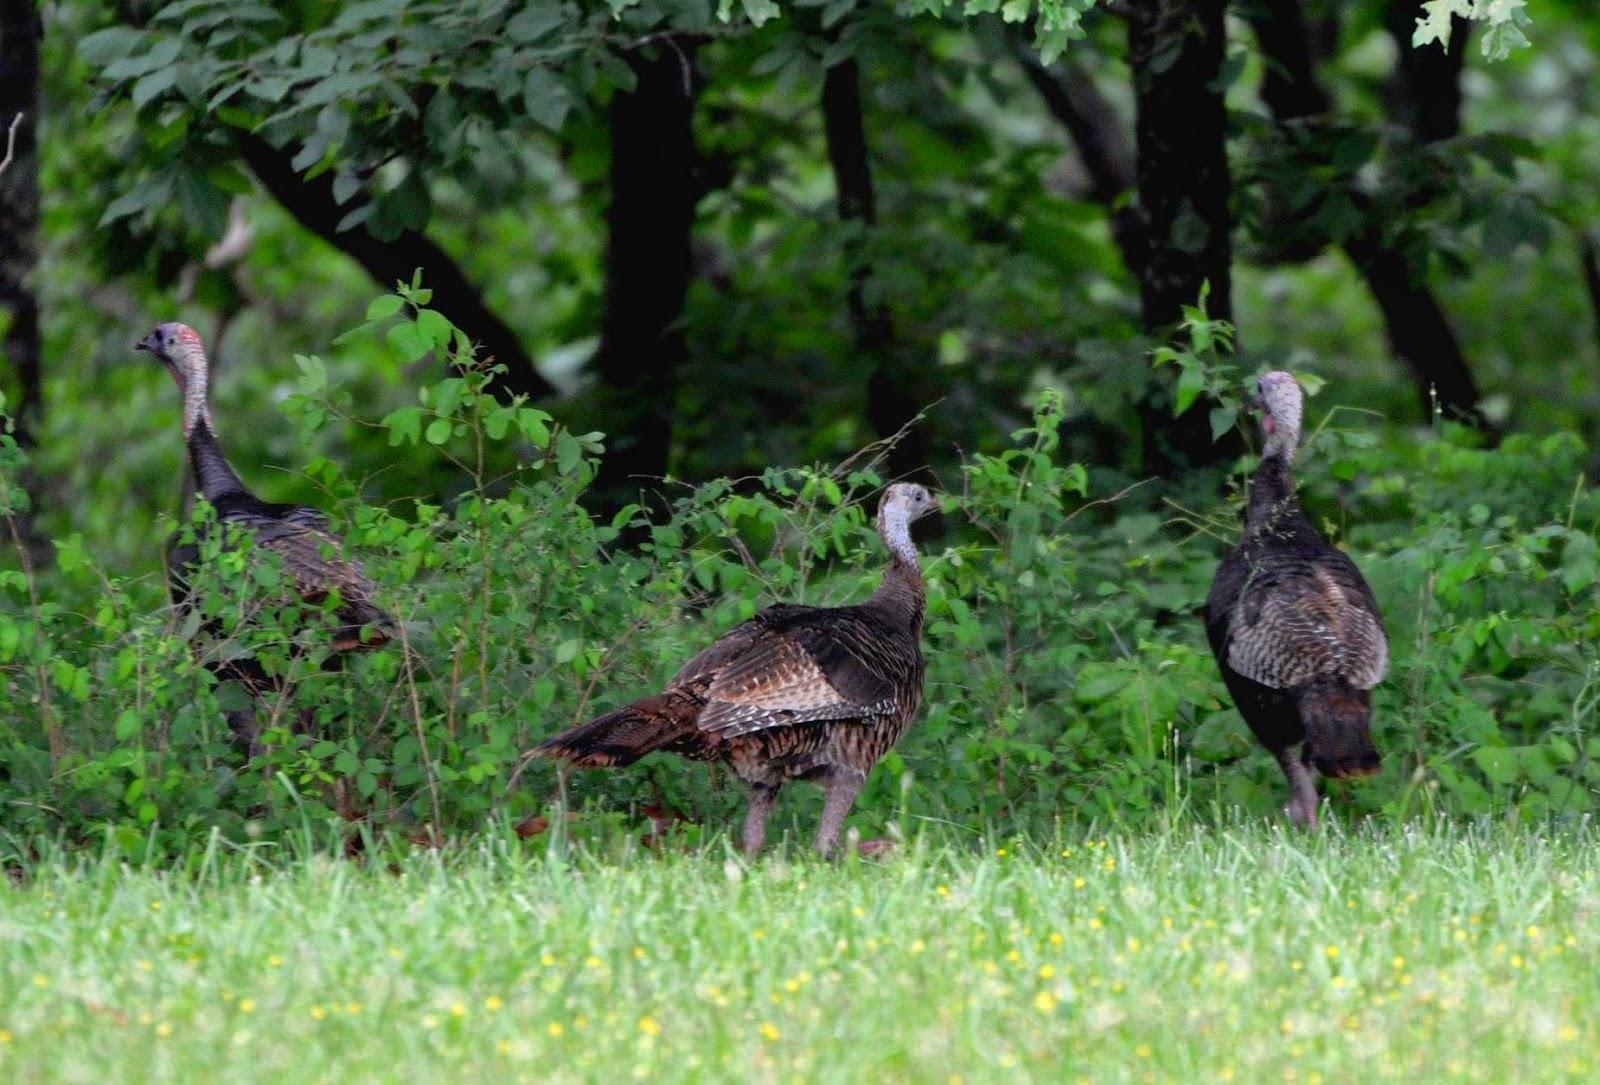 Native American Turkeys | Community Chickens